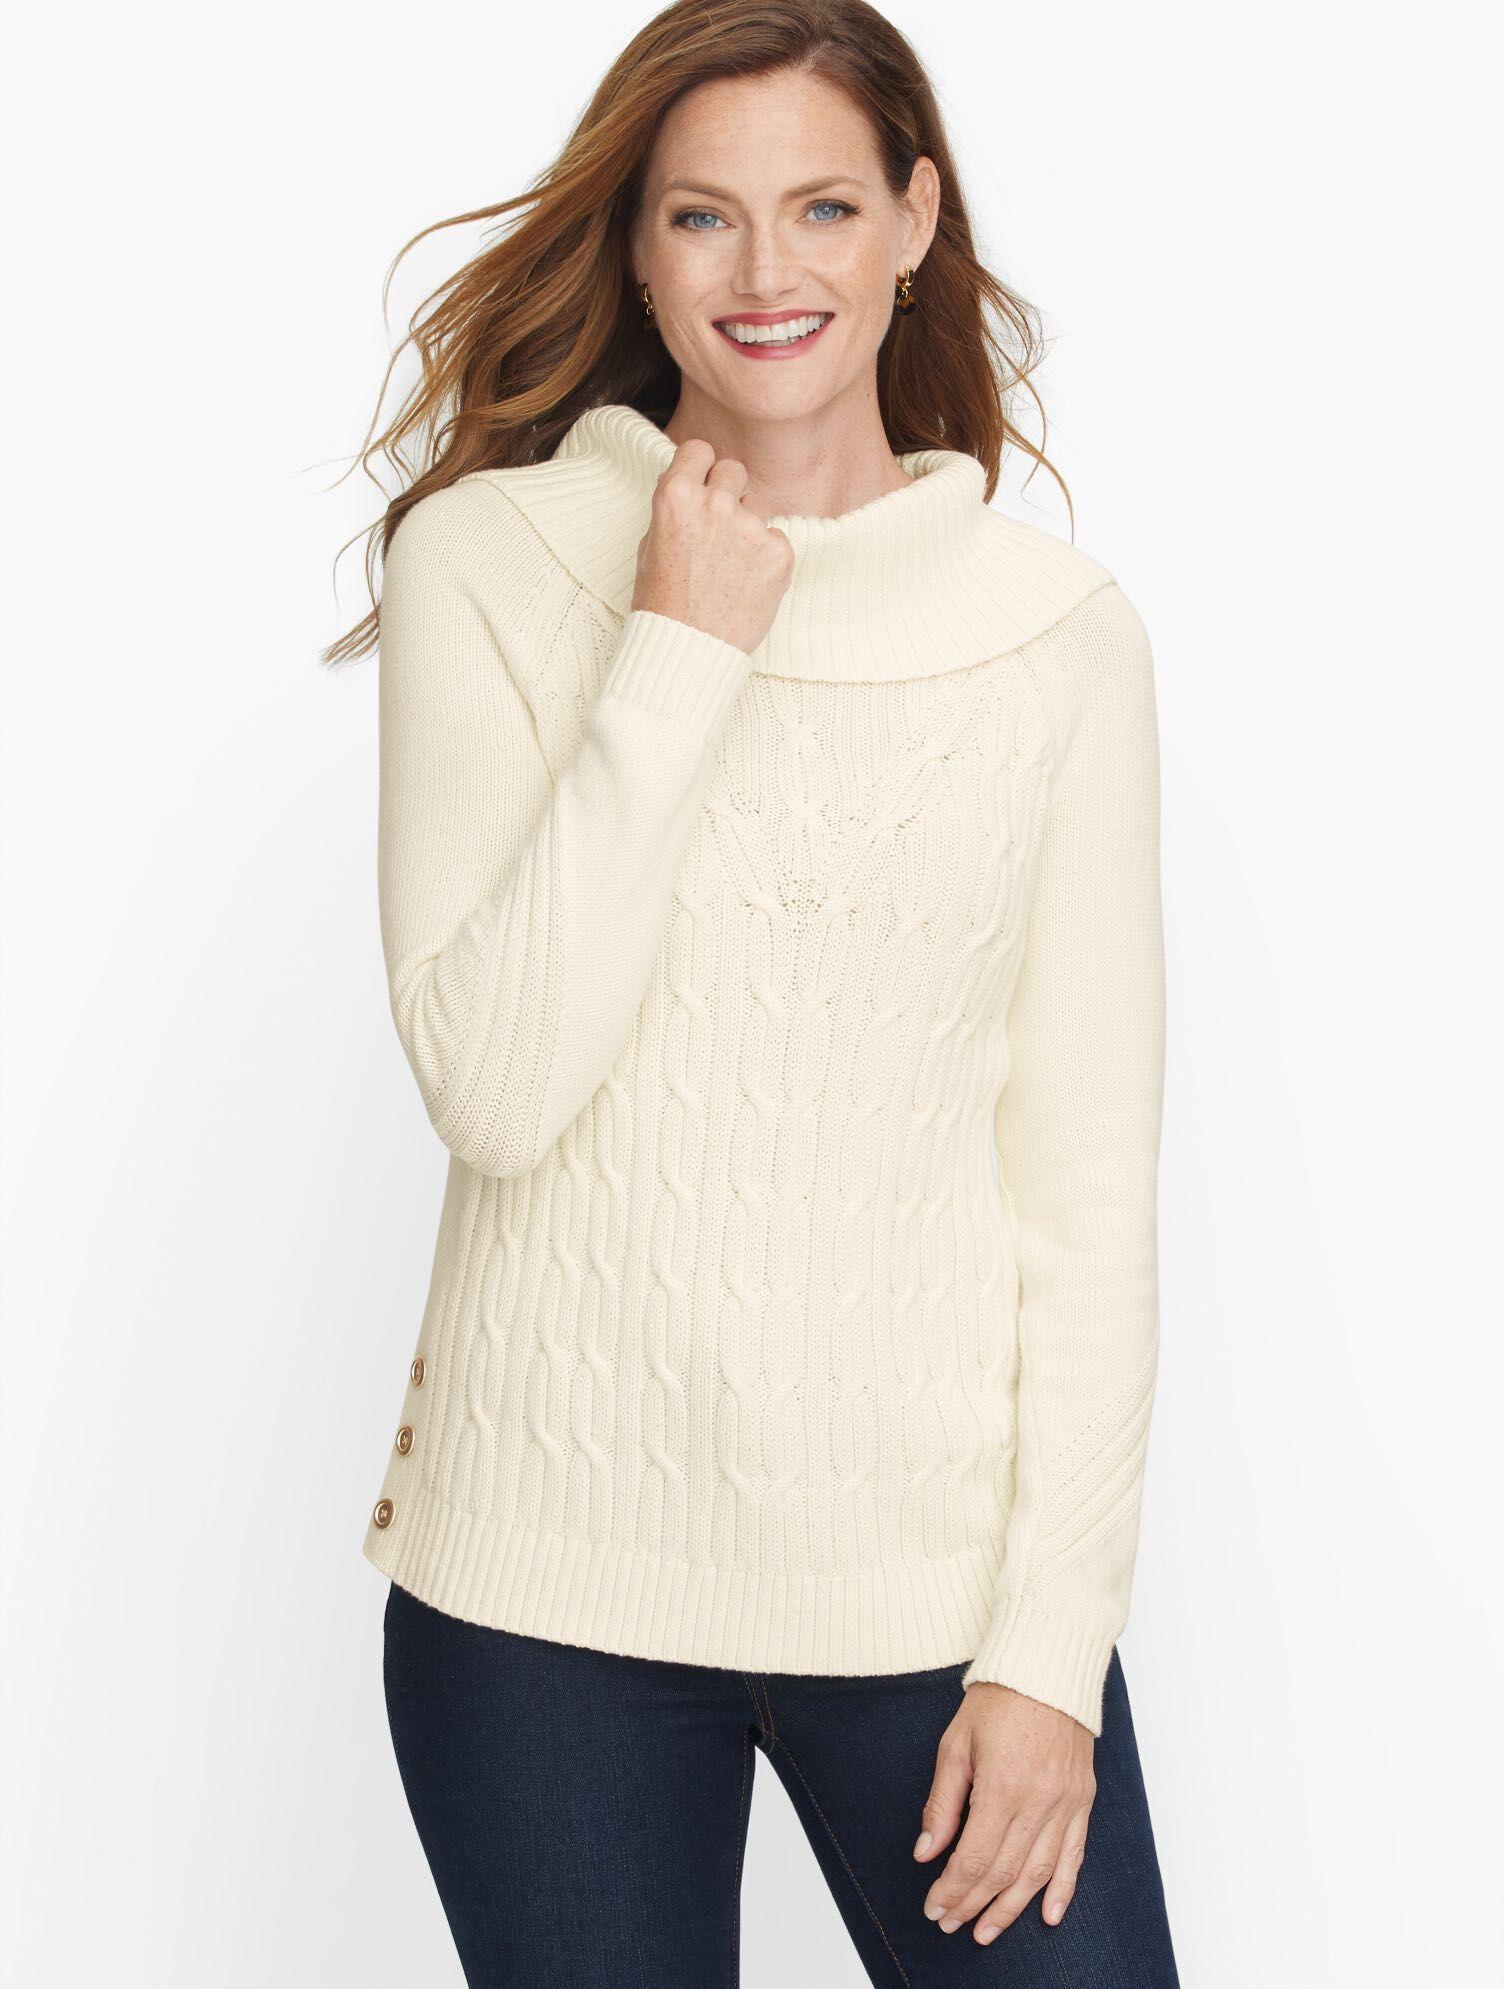 Talbots Cotton Cowlneck Sweater - Solid - Ivory - Medium Talbots  - Ivory - Size: female - Size: Medium